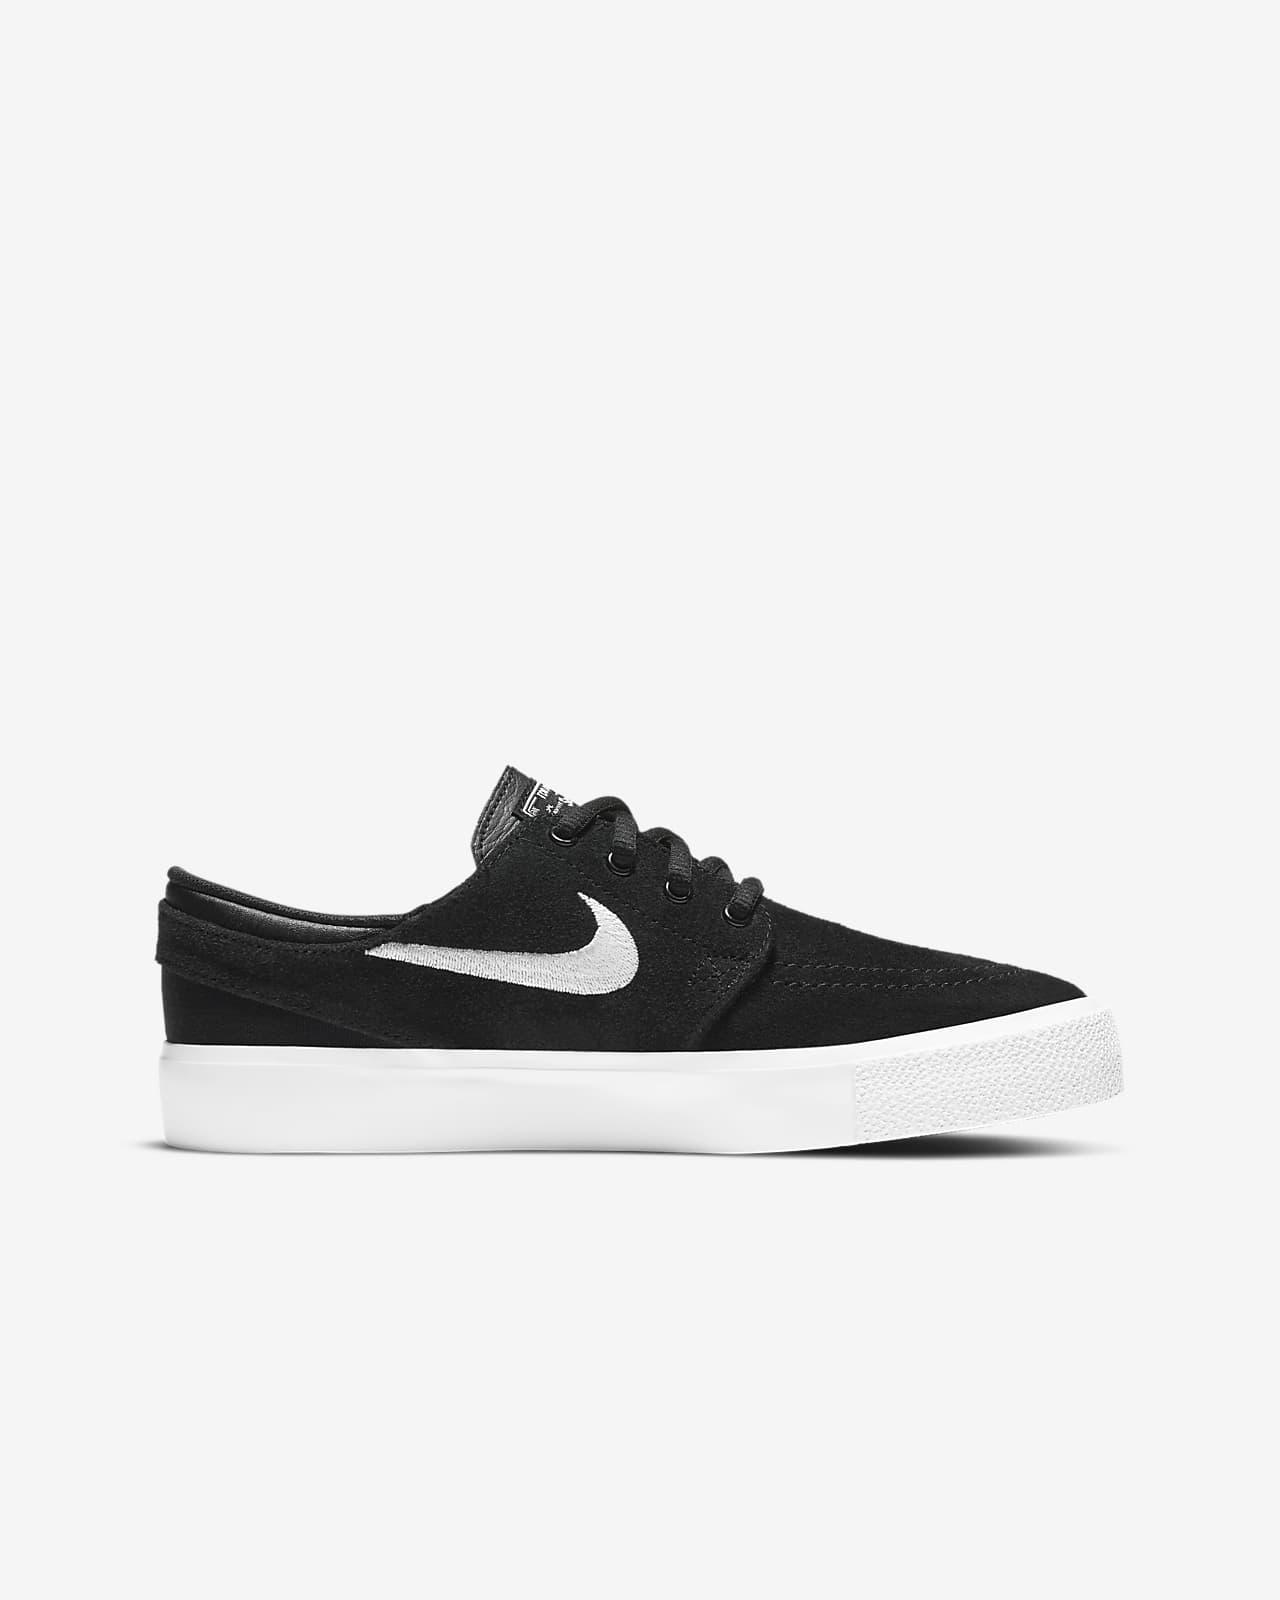 Chaussure de skateboard Nike SB Stefan Janoski pour Enfant plus âgé